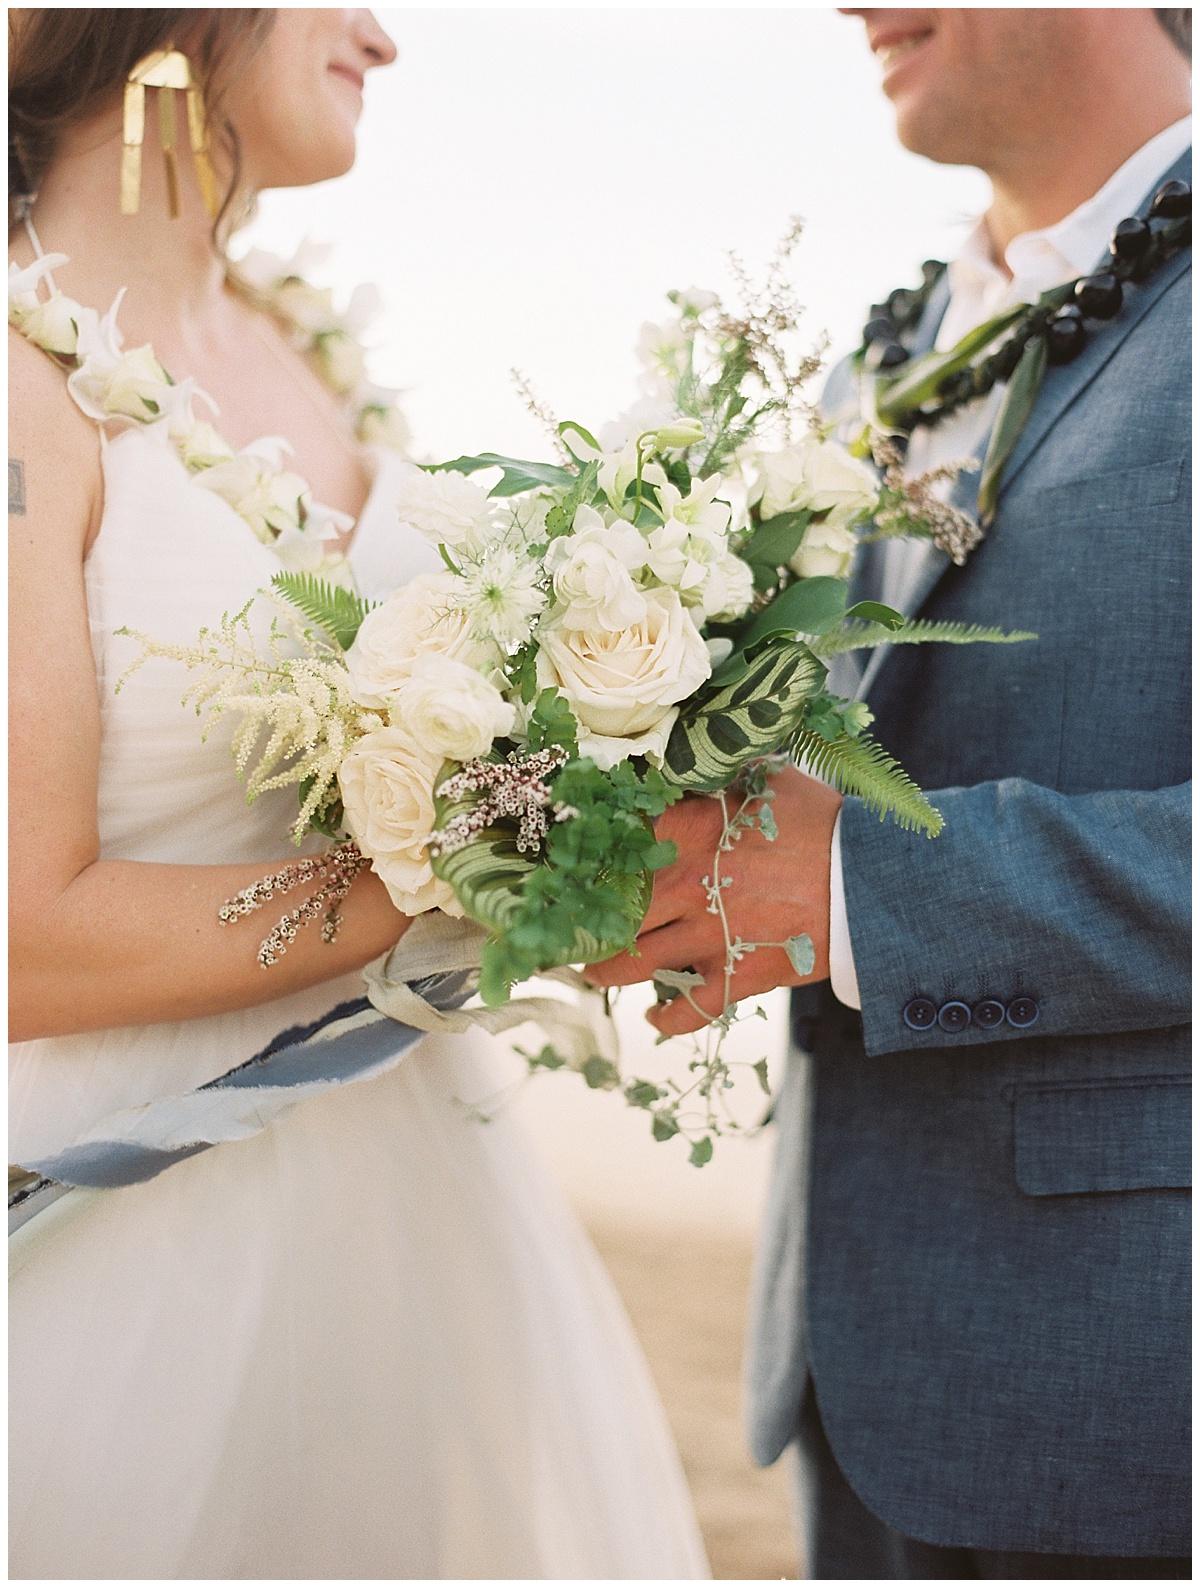 beach-elopement-bride-groom-holding-hands-white-flower-bouquet.jpg